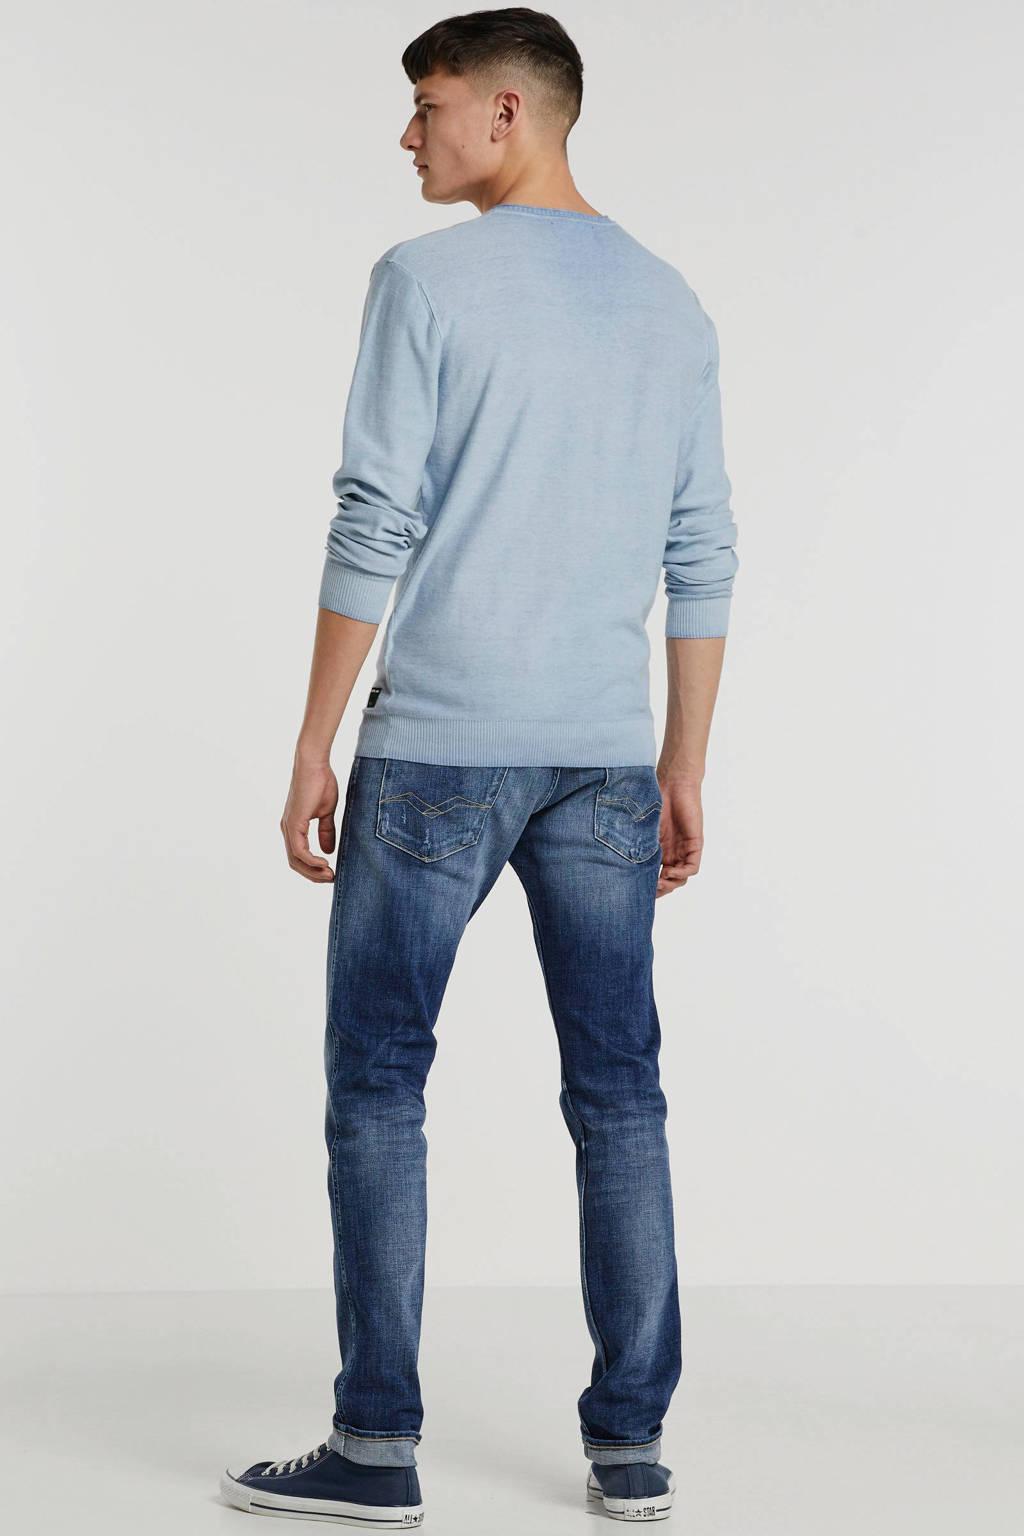 REPLAY trui lichtblauw, Lichtblauw